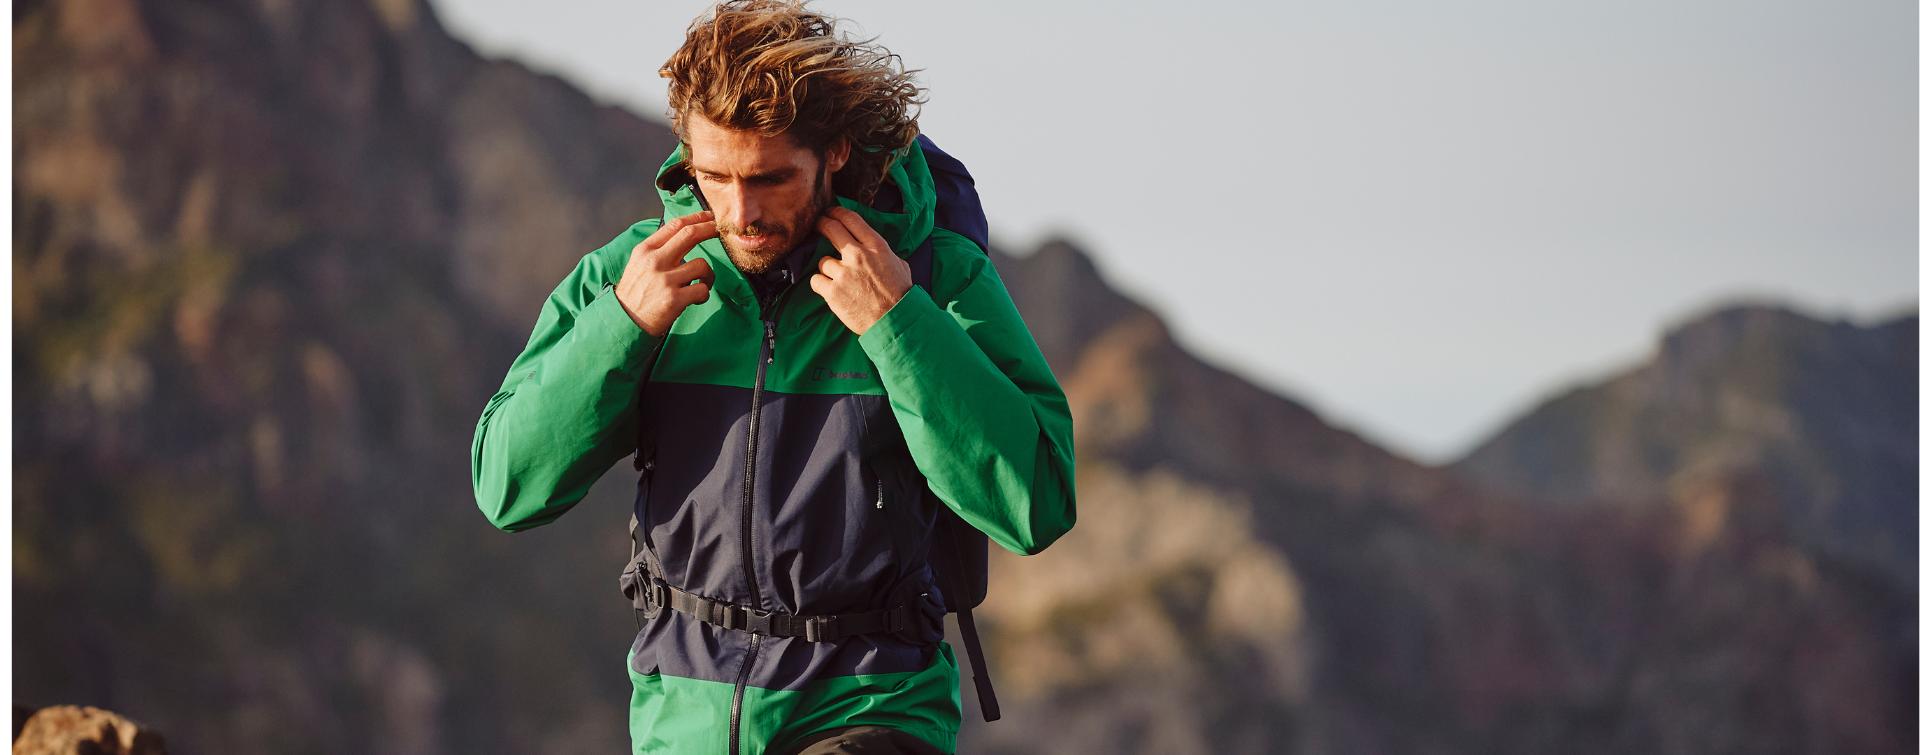 Chaquetas impermeables para Hombre I  Tienda online oficial Berghaus®